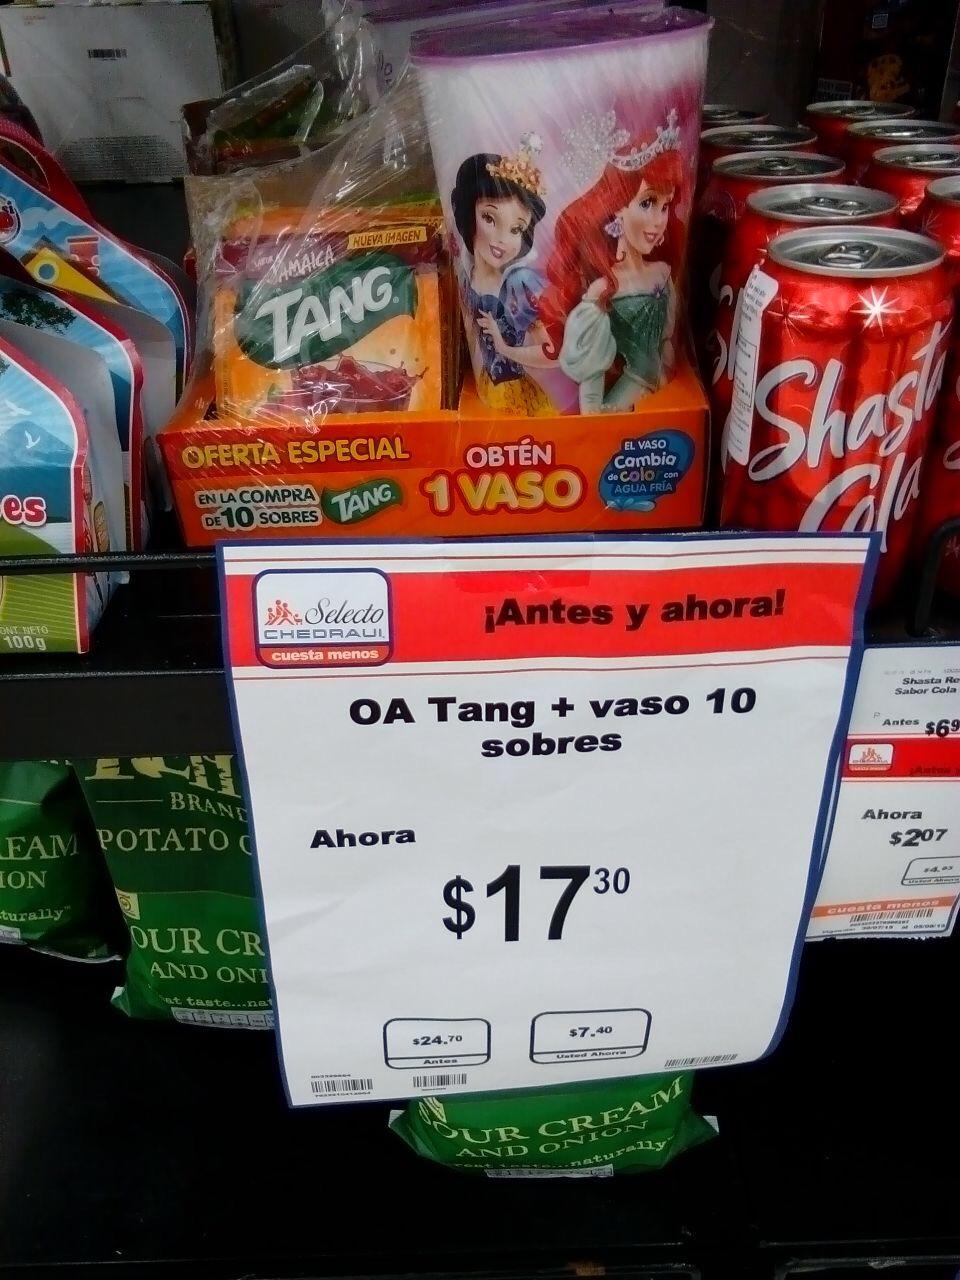 Chedraui: 10 sobres de tang + vaso gratis a $17.30